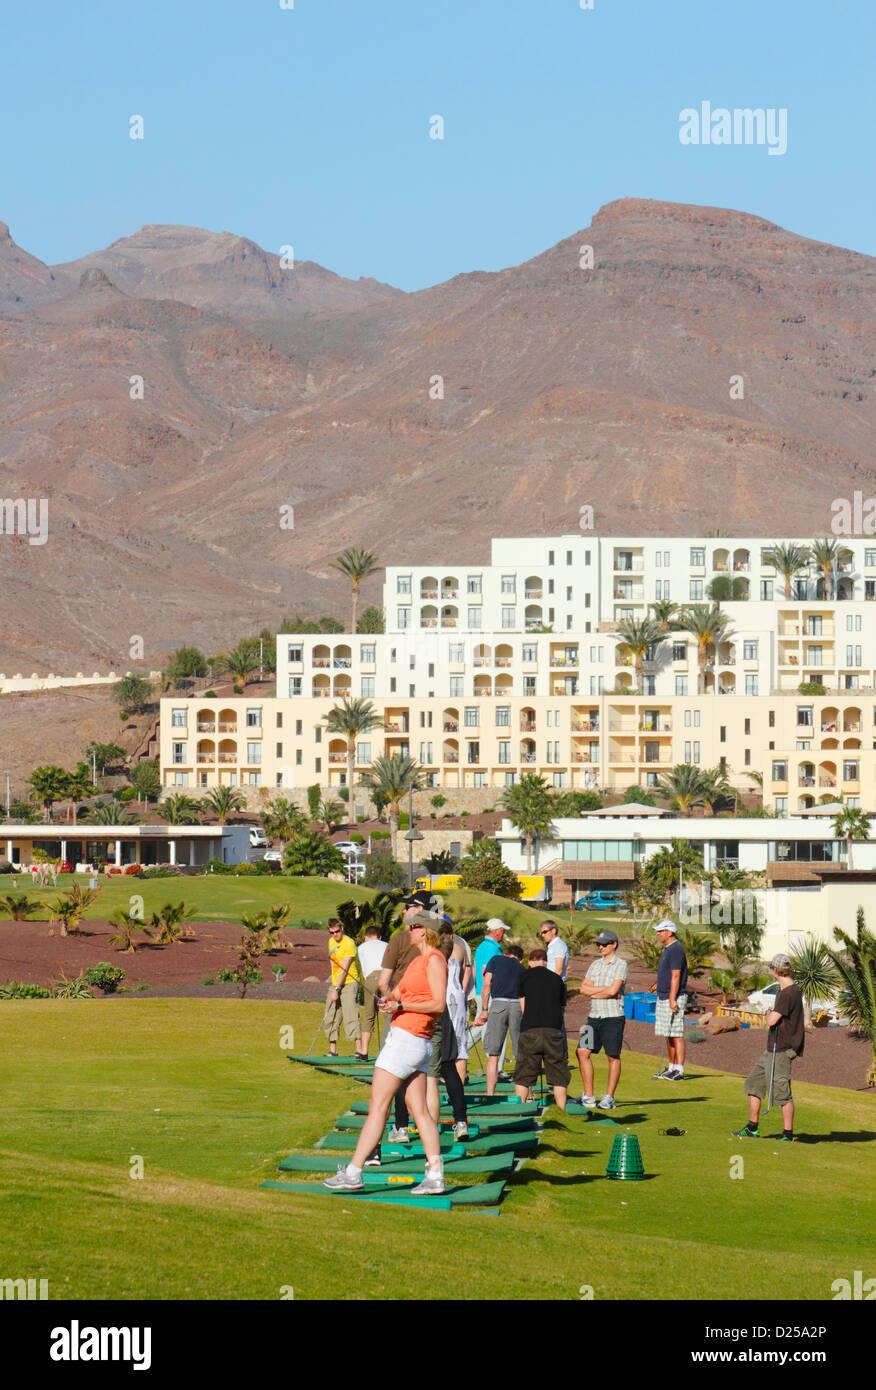 Golf driving range at Las Playitas on Fuerteventura, Cnary Islands, Spain - Stock Image